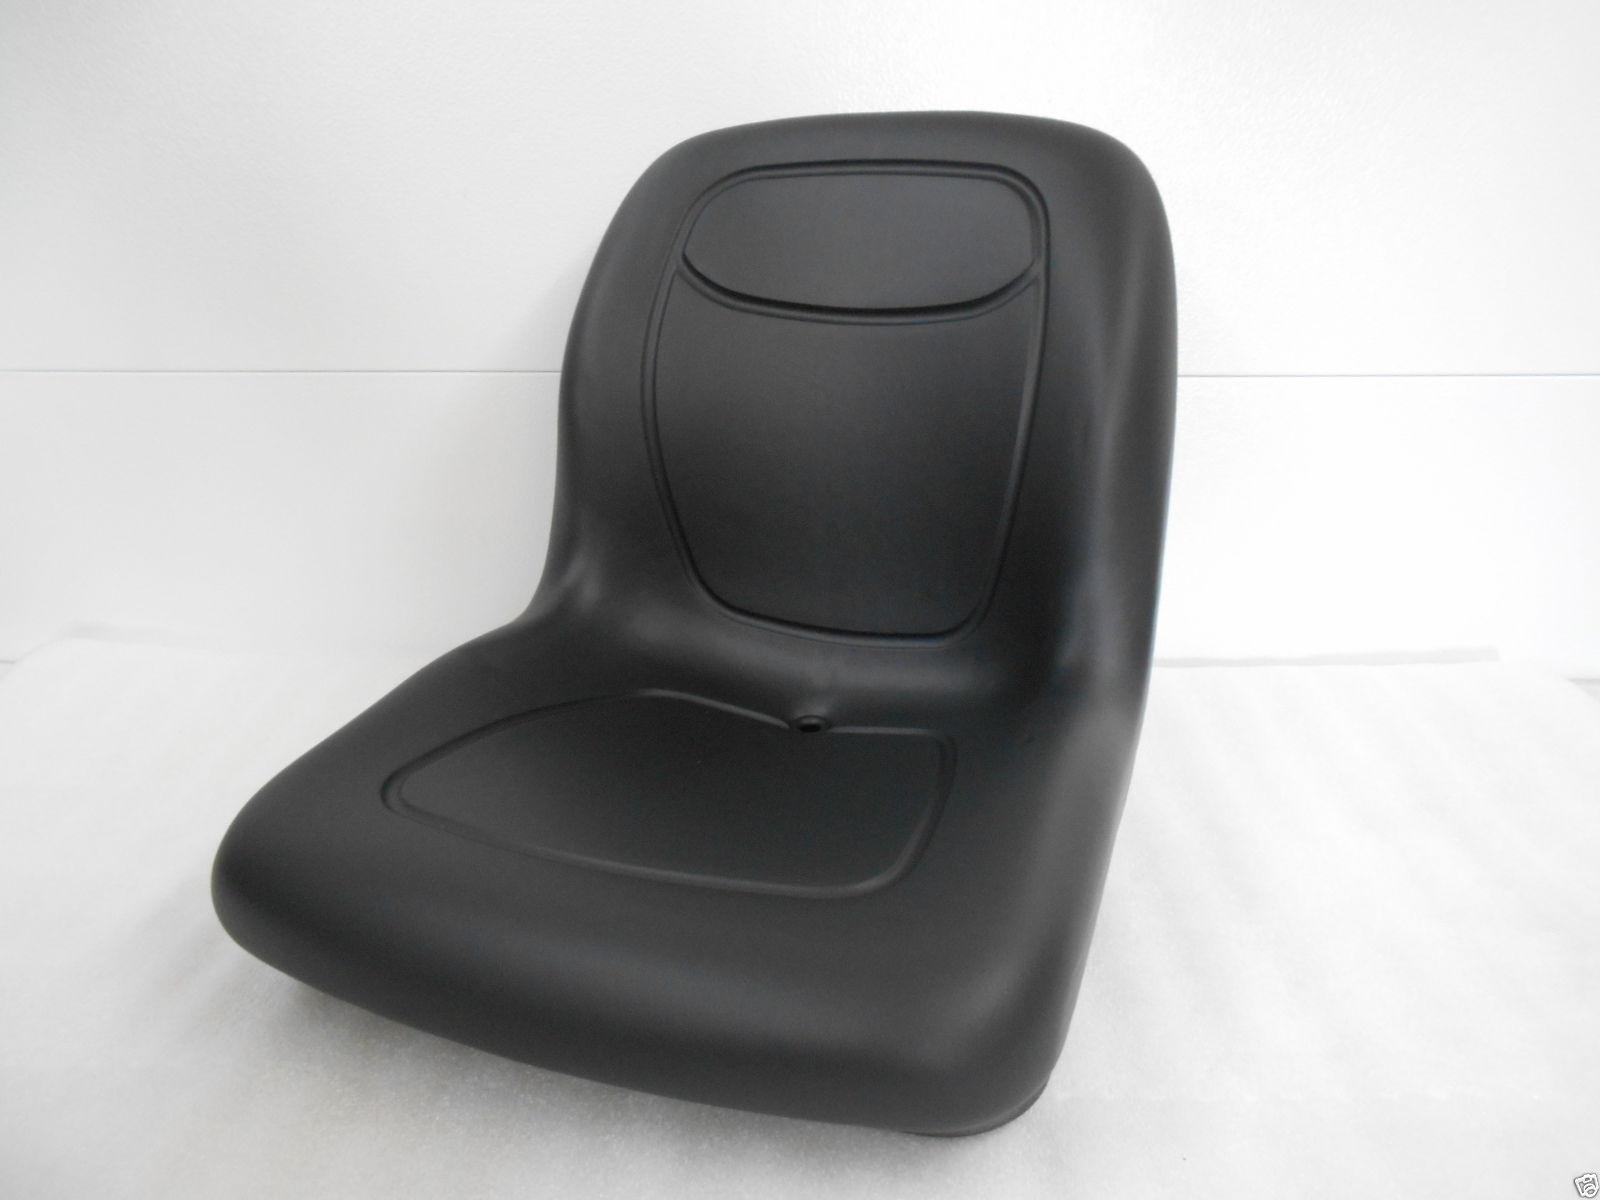 John Deere Seats Back : New black high back seat for john deere